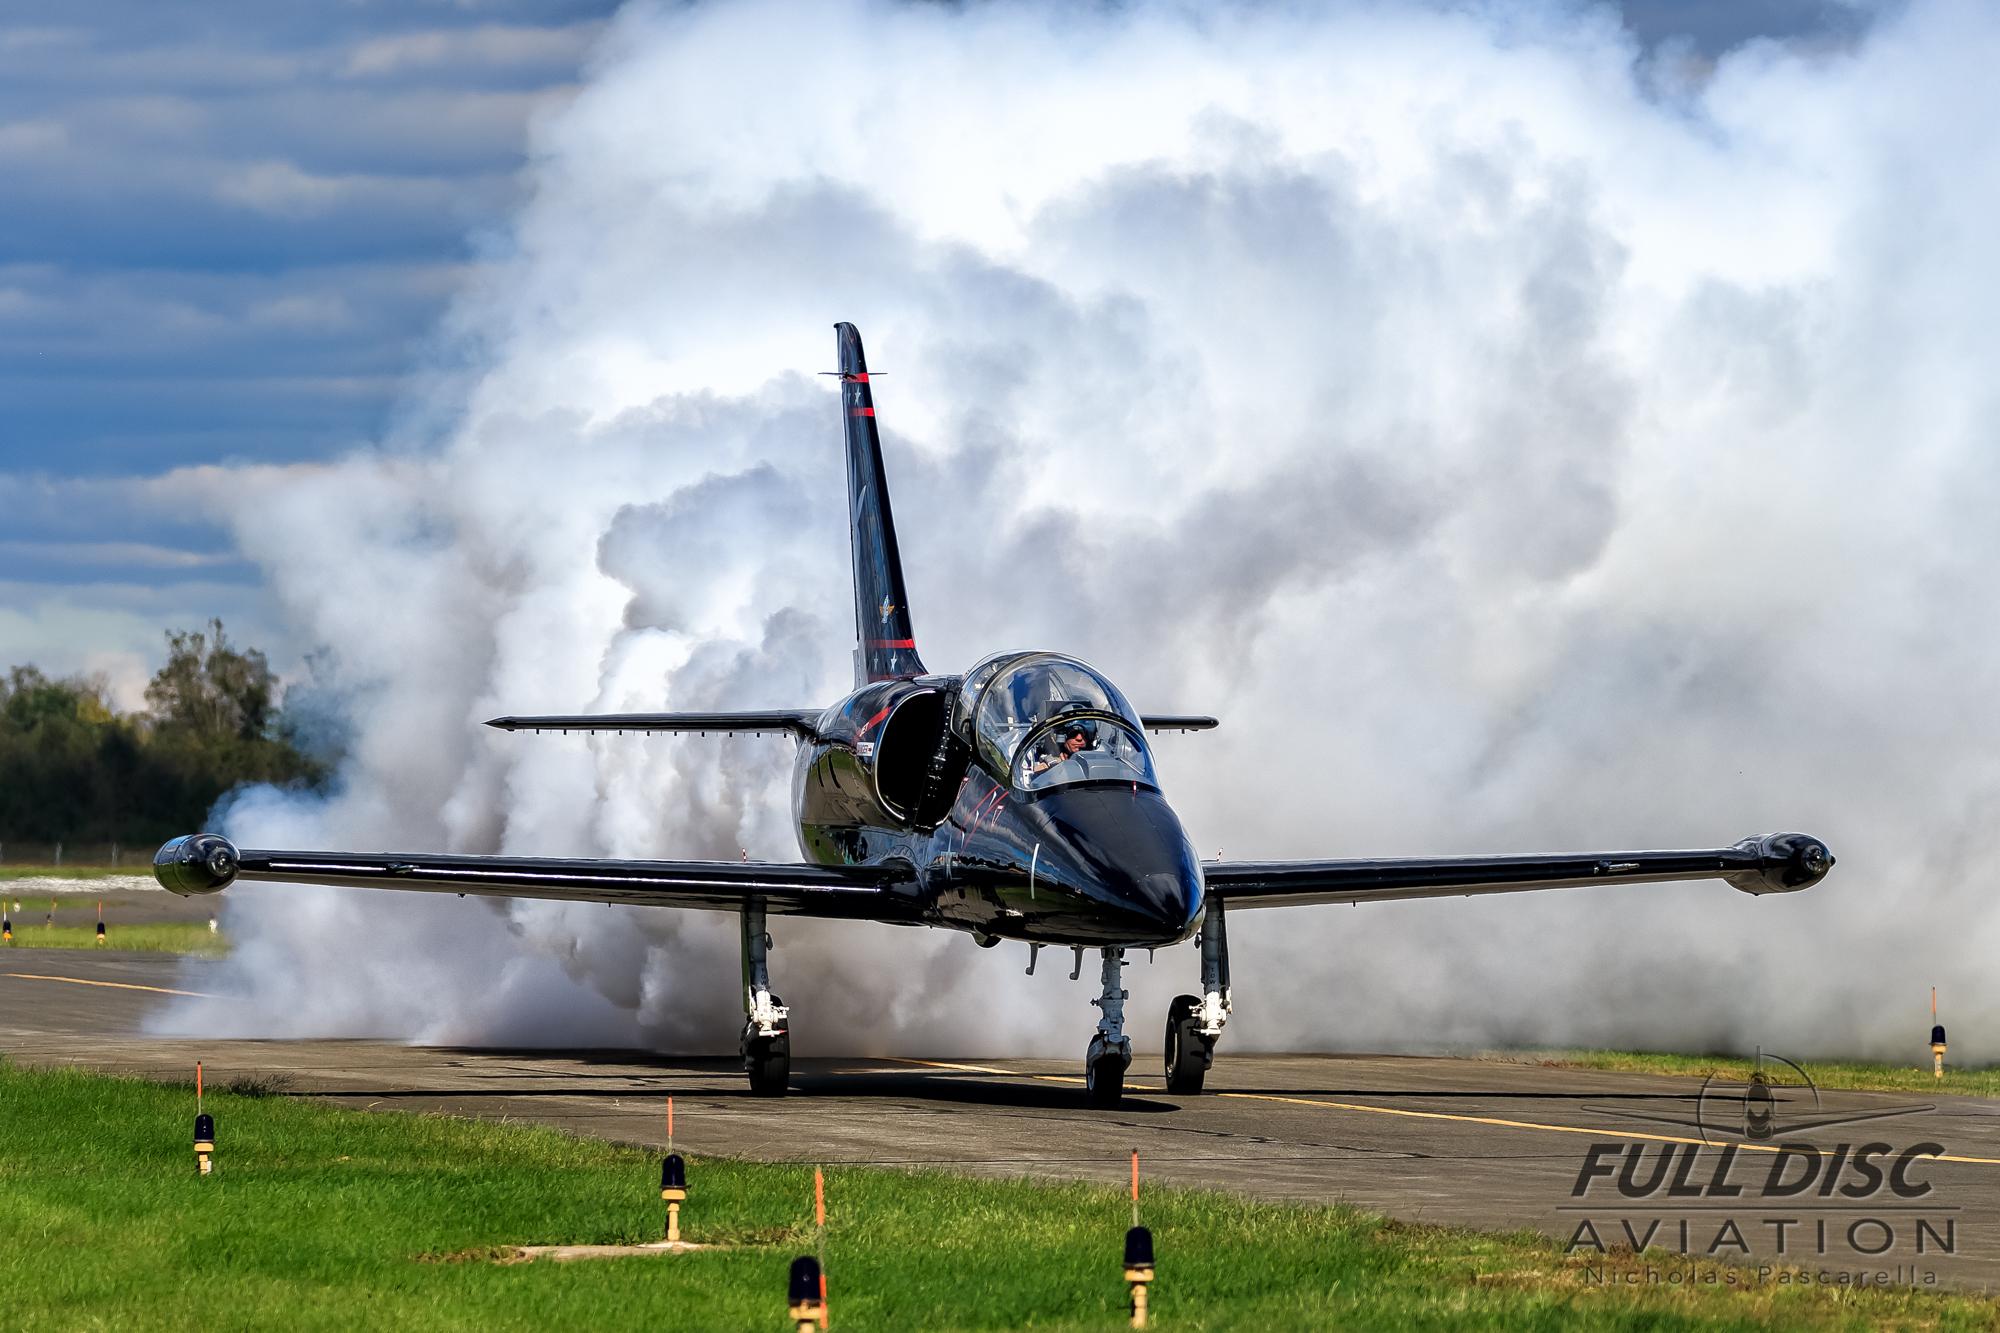 nickpascarella_nicholaspascarella_fulldiscaviation_aircraft_l38_albatross_smoke.jpg